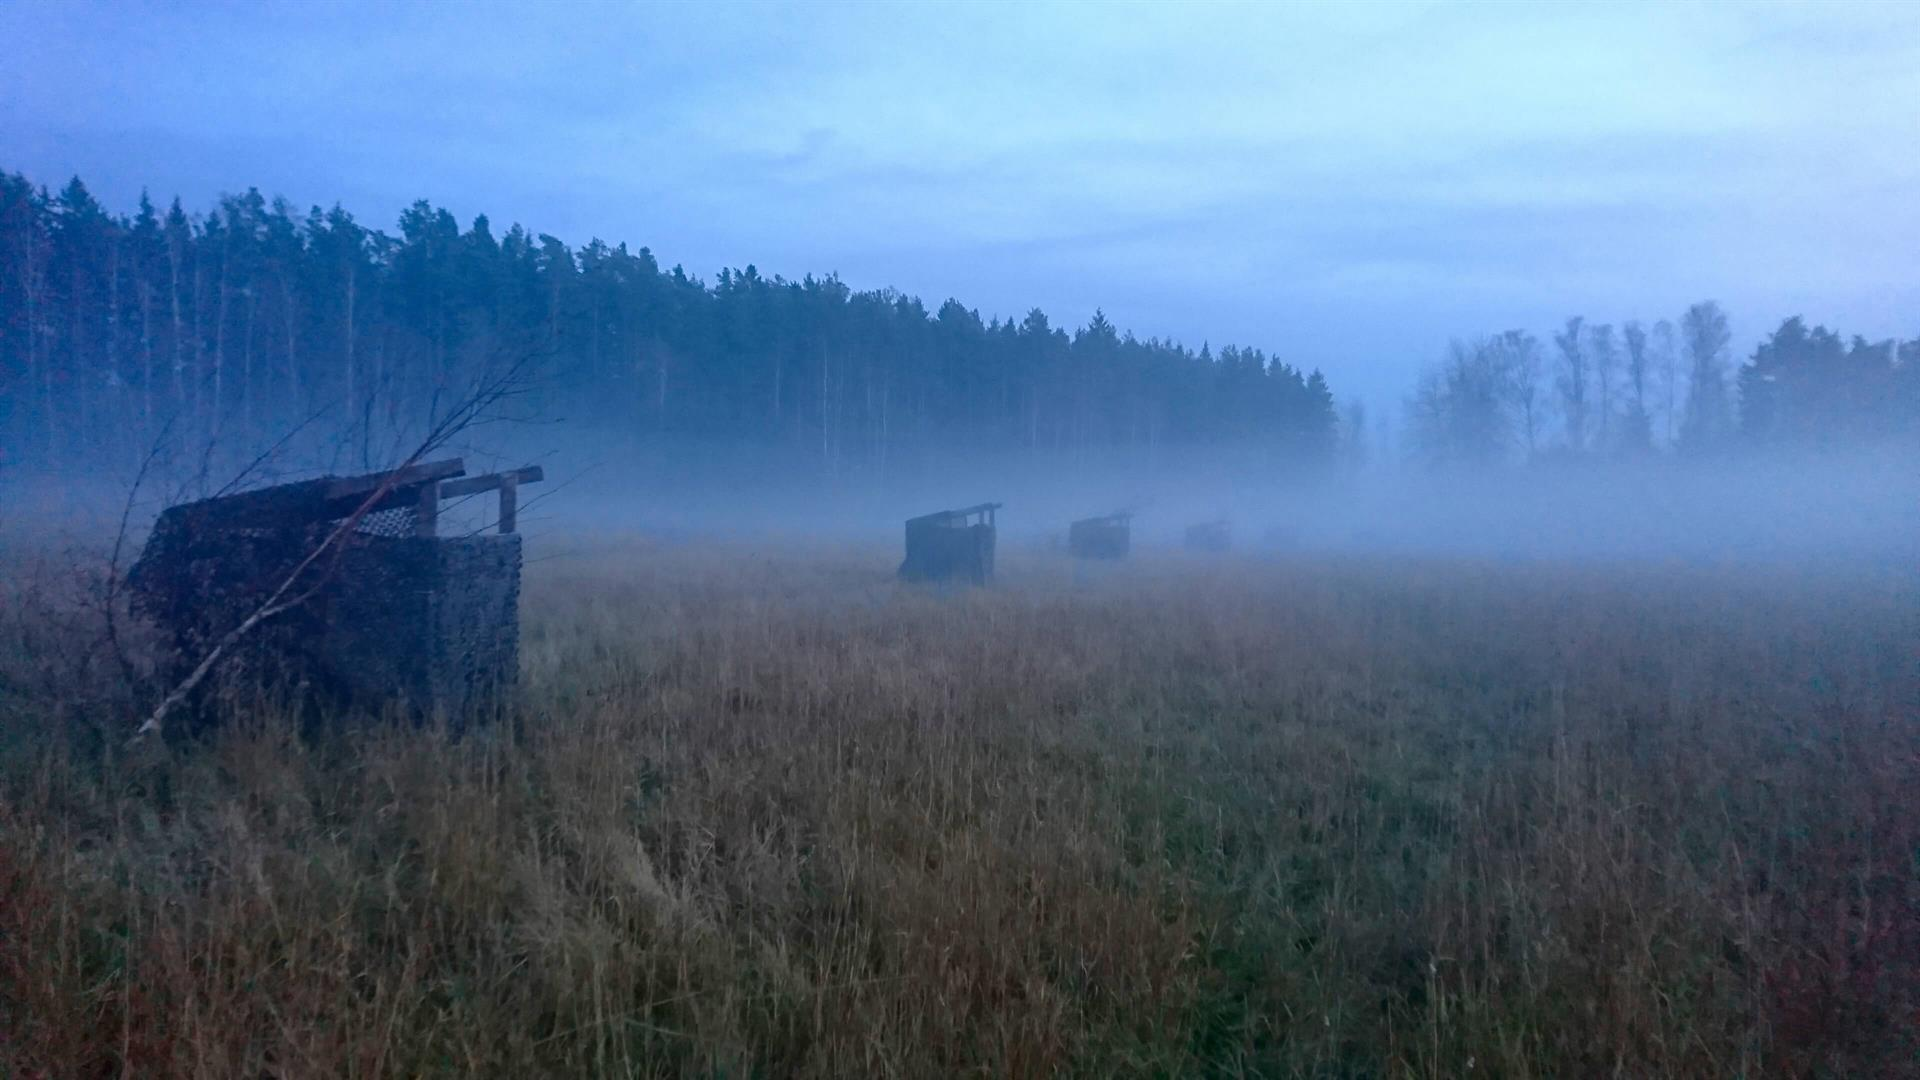 Sorsajahtia Norrby Gårdissa